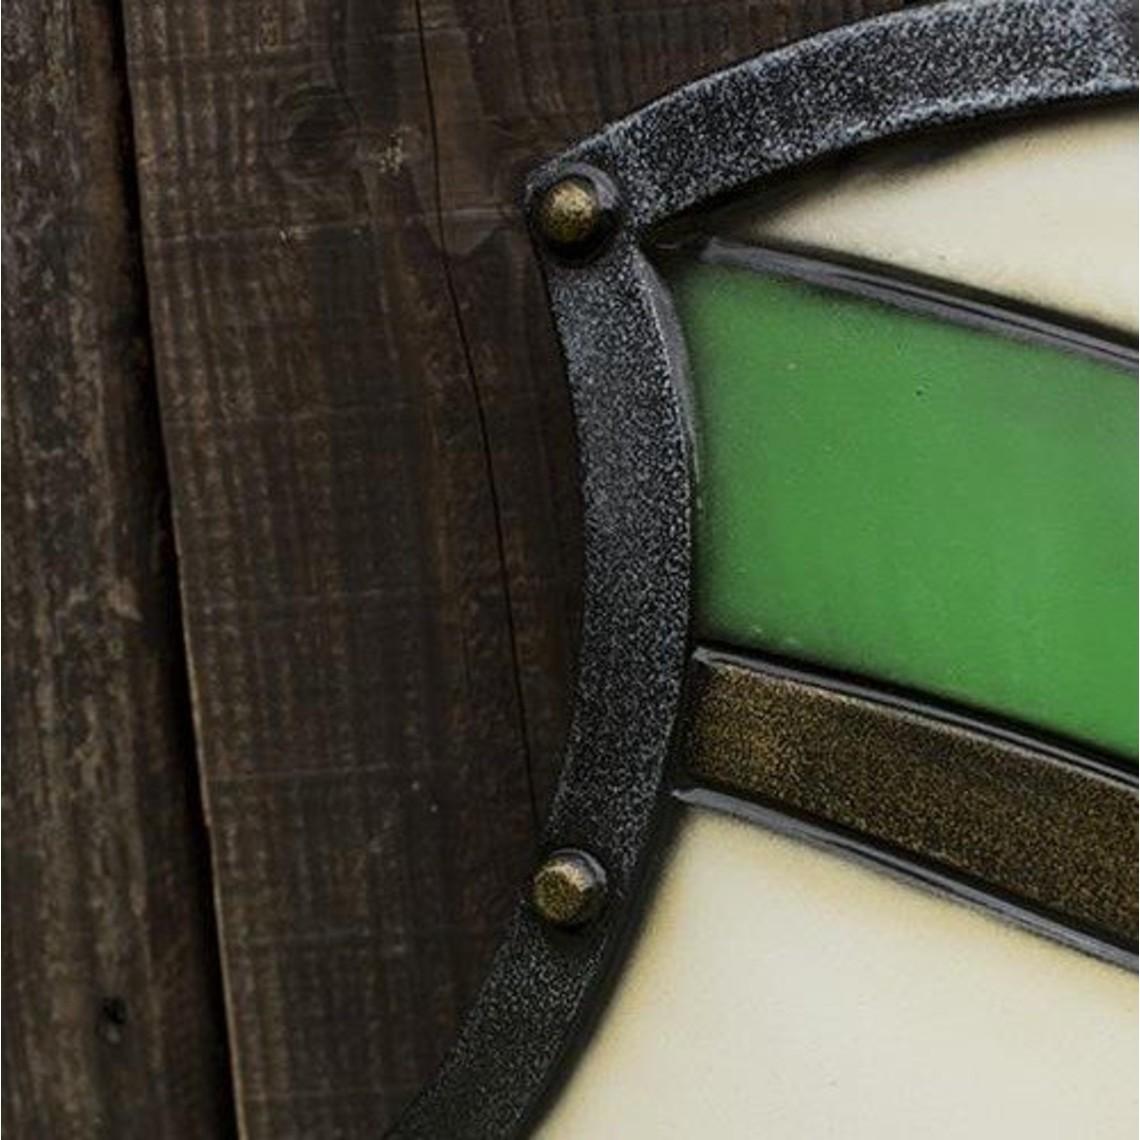 Epic Armoury Knight Shield, groen/wit, LARP schild